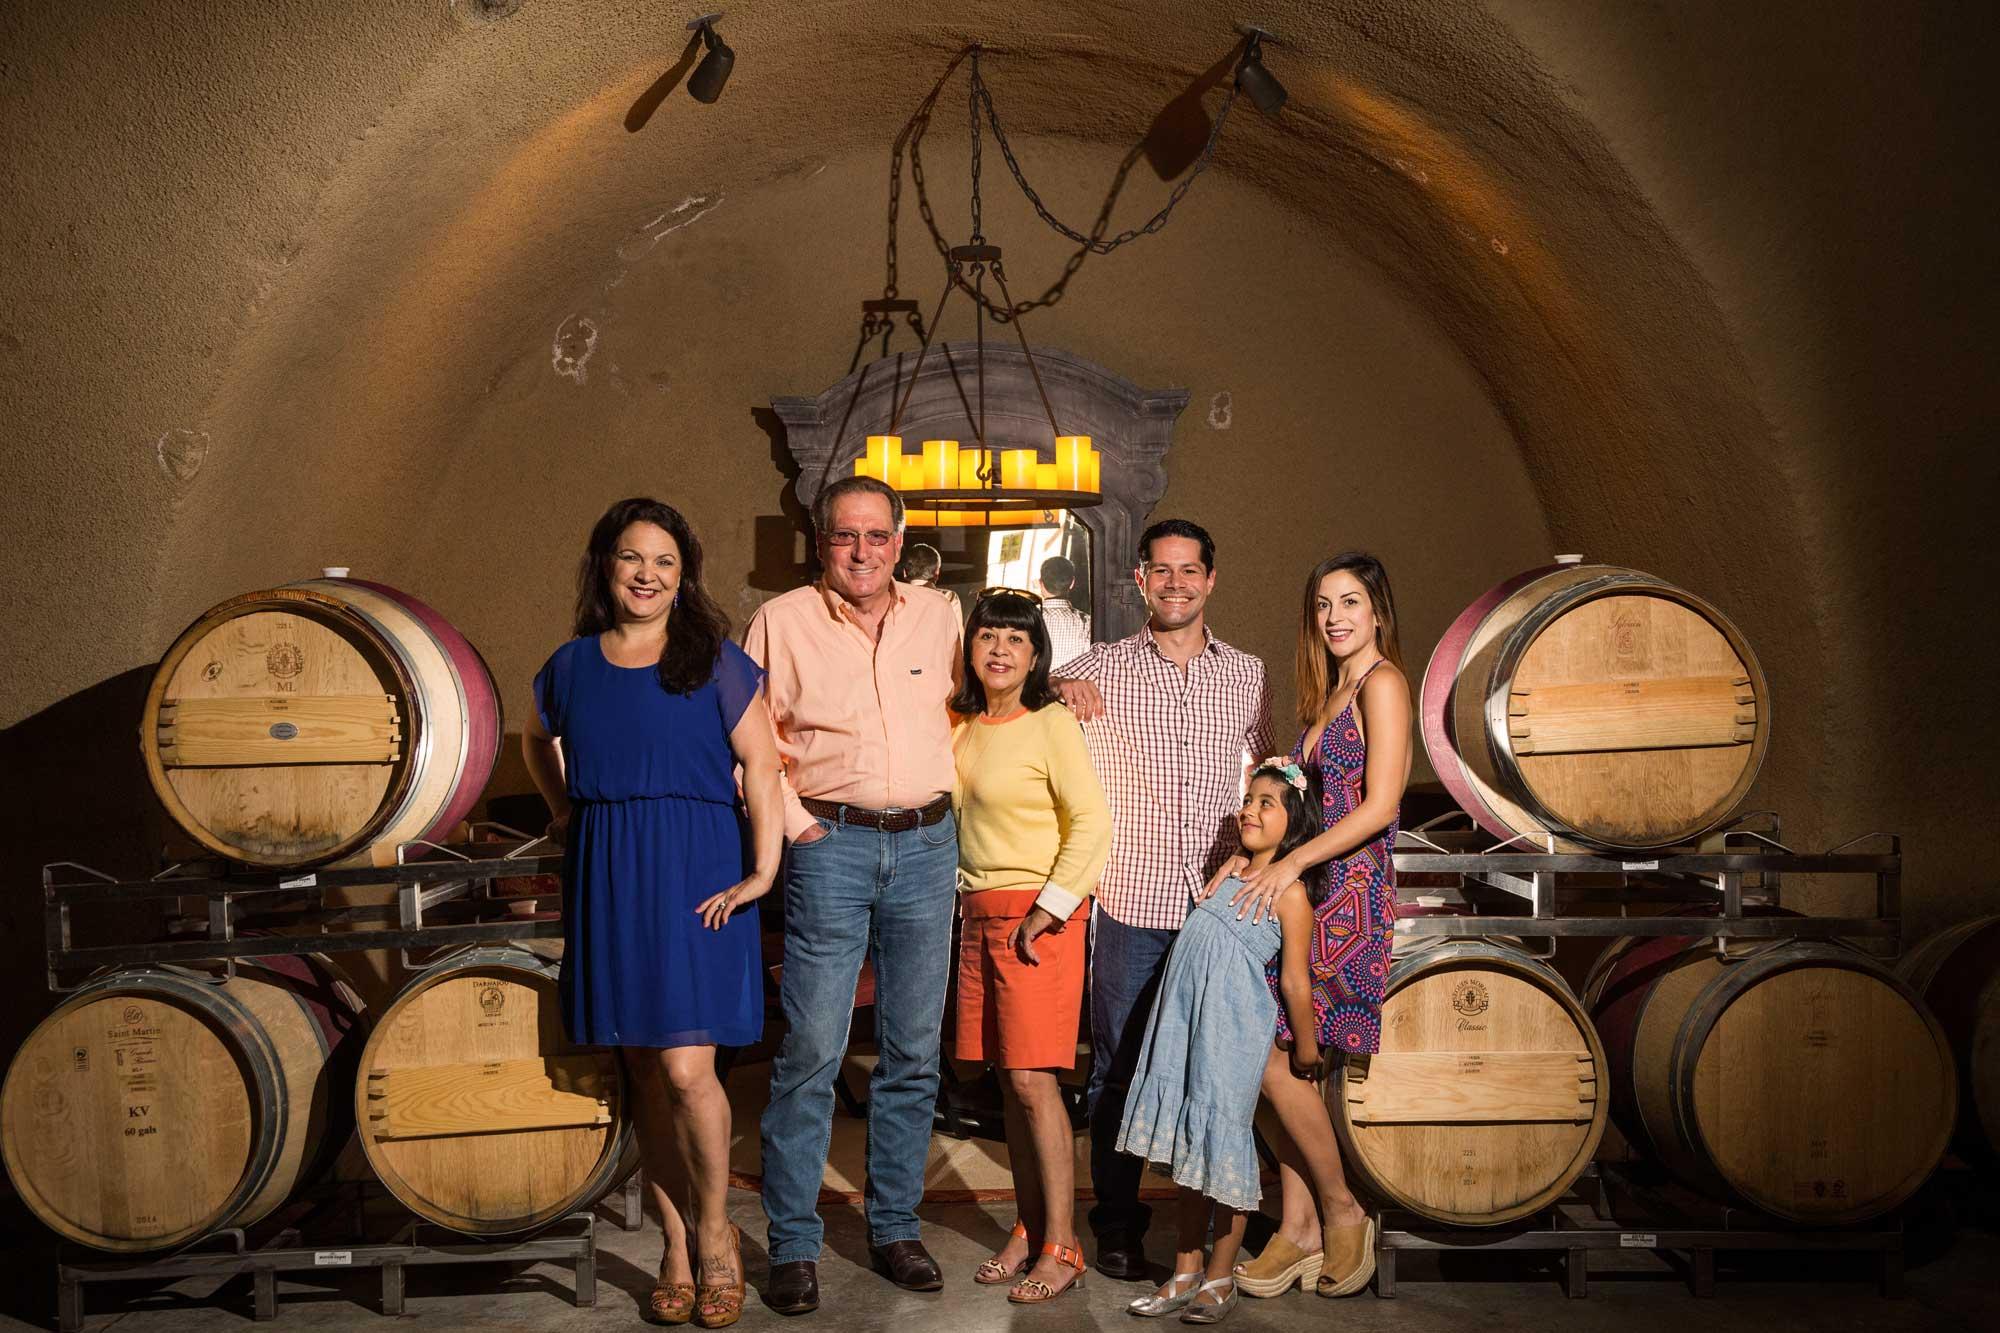 The Keever Family Winery Napa Valley